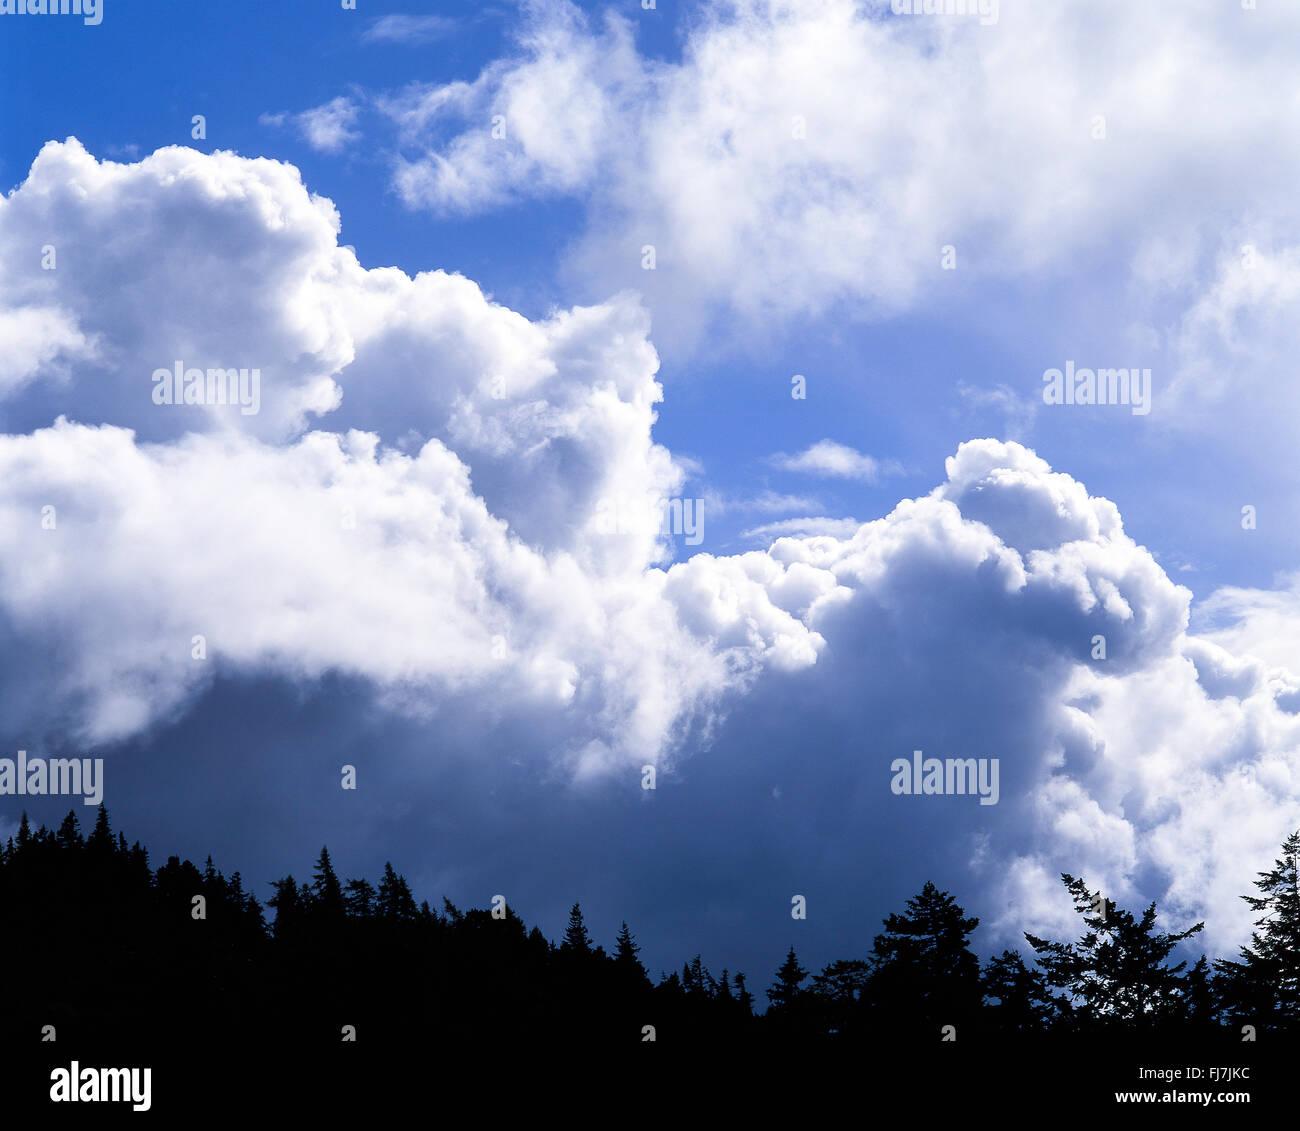 Nubes de tormenta se aproxima, Berkshire, Inglaterra, Reino Unido Imagen De Stock